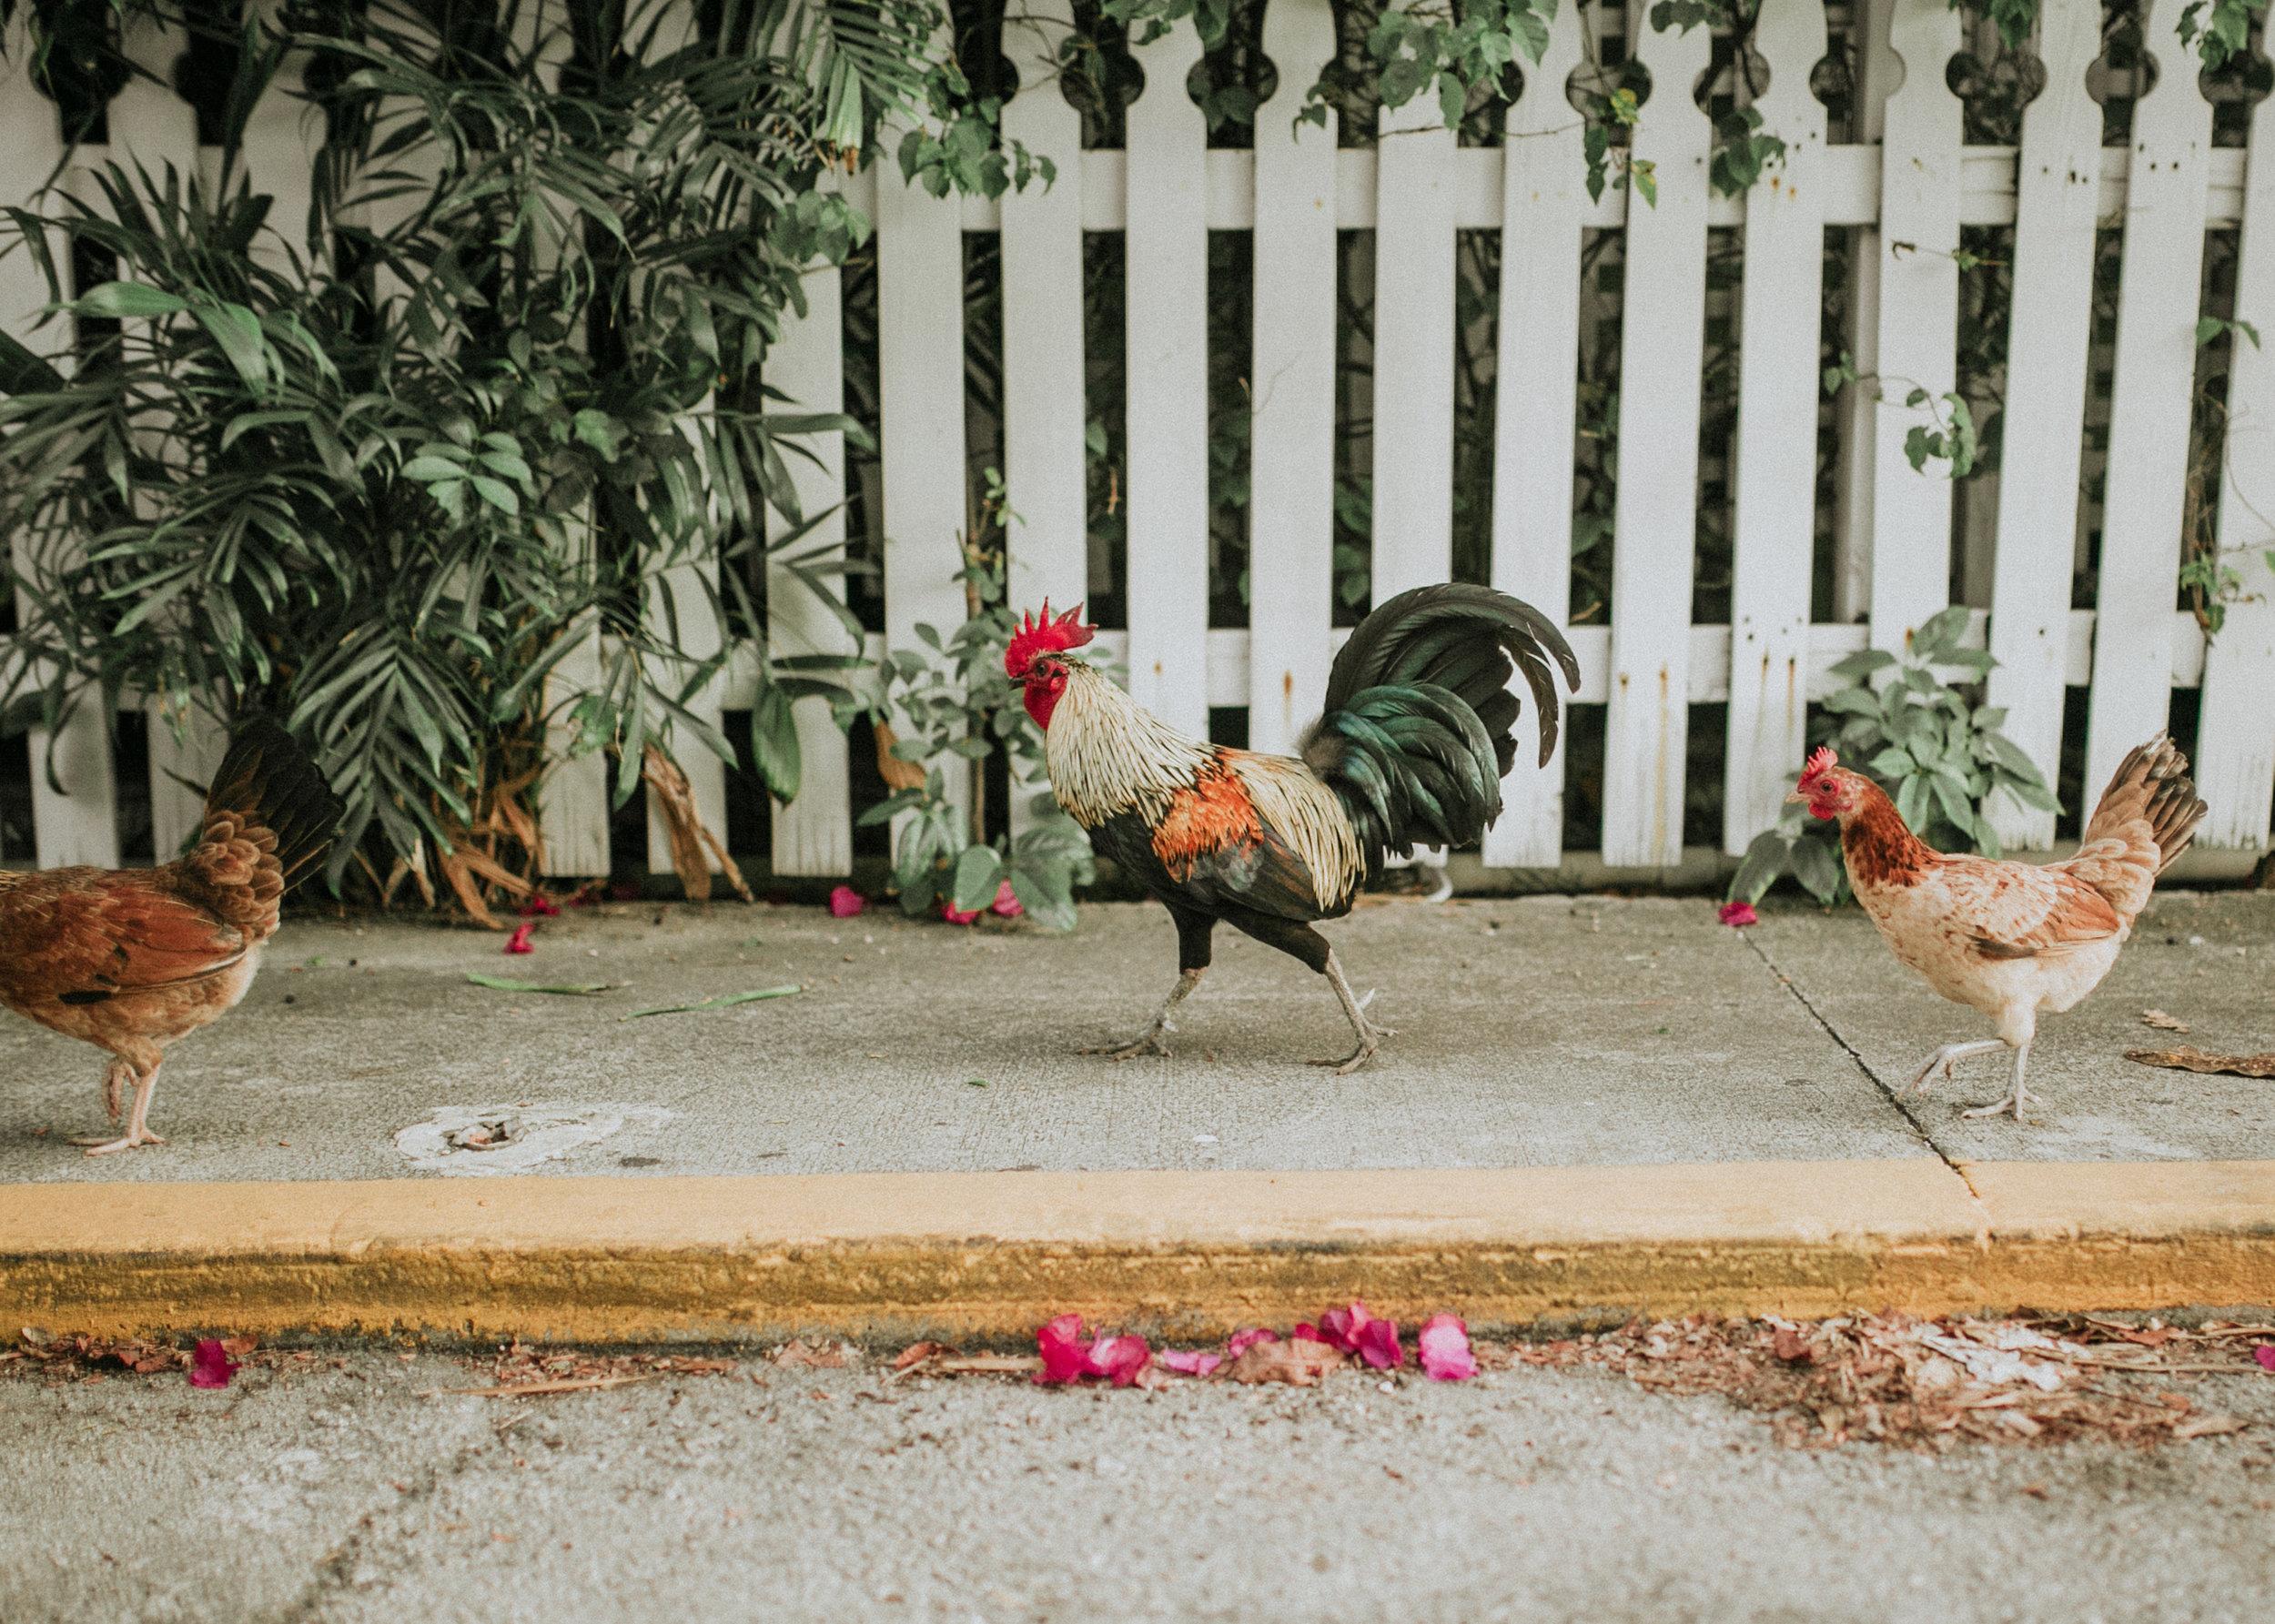 florida, florida photographer, florida keys, tropical, destination wedding, elopement, beach life, island, southern life, key west wedding, engagement, fort zachary, lena perkins, key west, key west photography, key west rooster-20.jpg